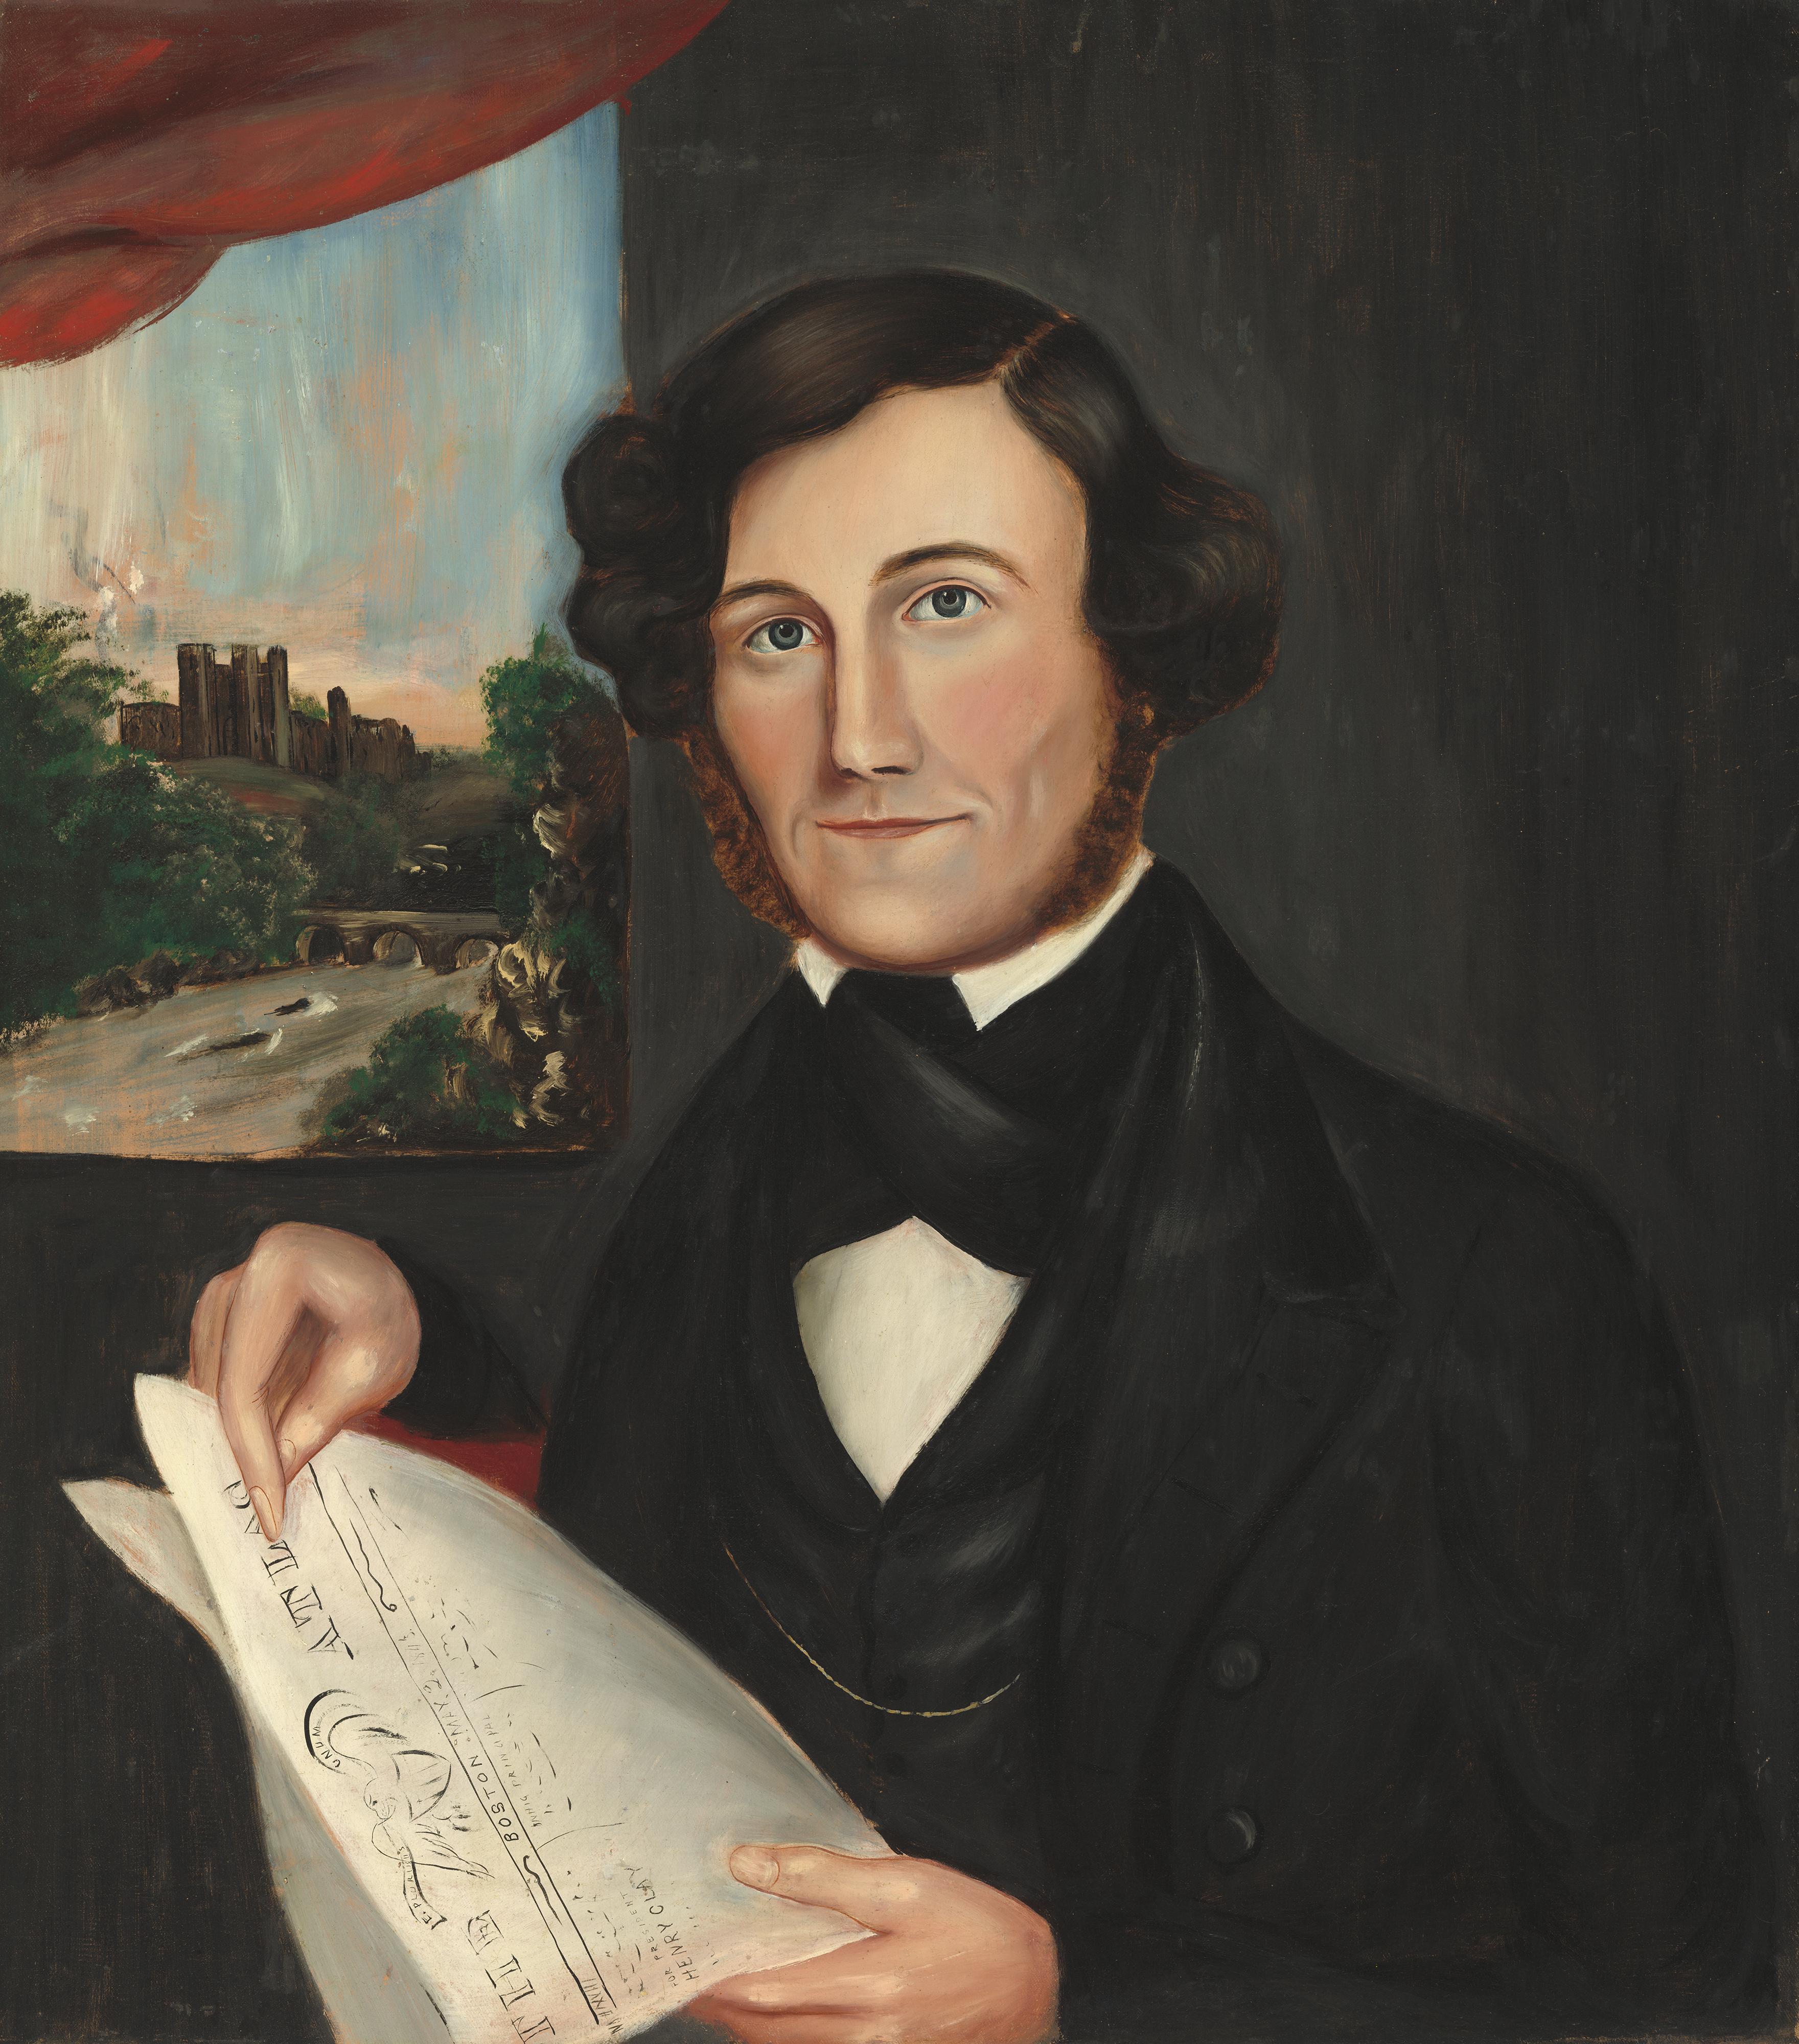 File:American 19th Century, Man Named Hubbard Reading 'Boston Atlas', 1843 or after, NGA 56729.jpg